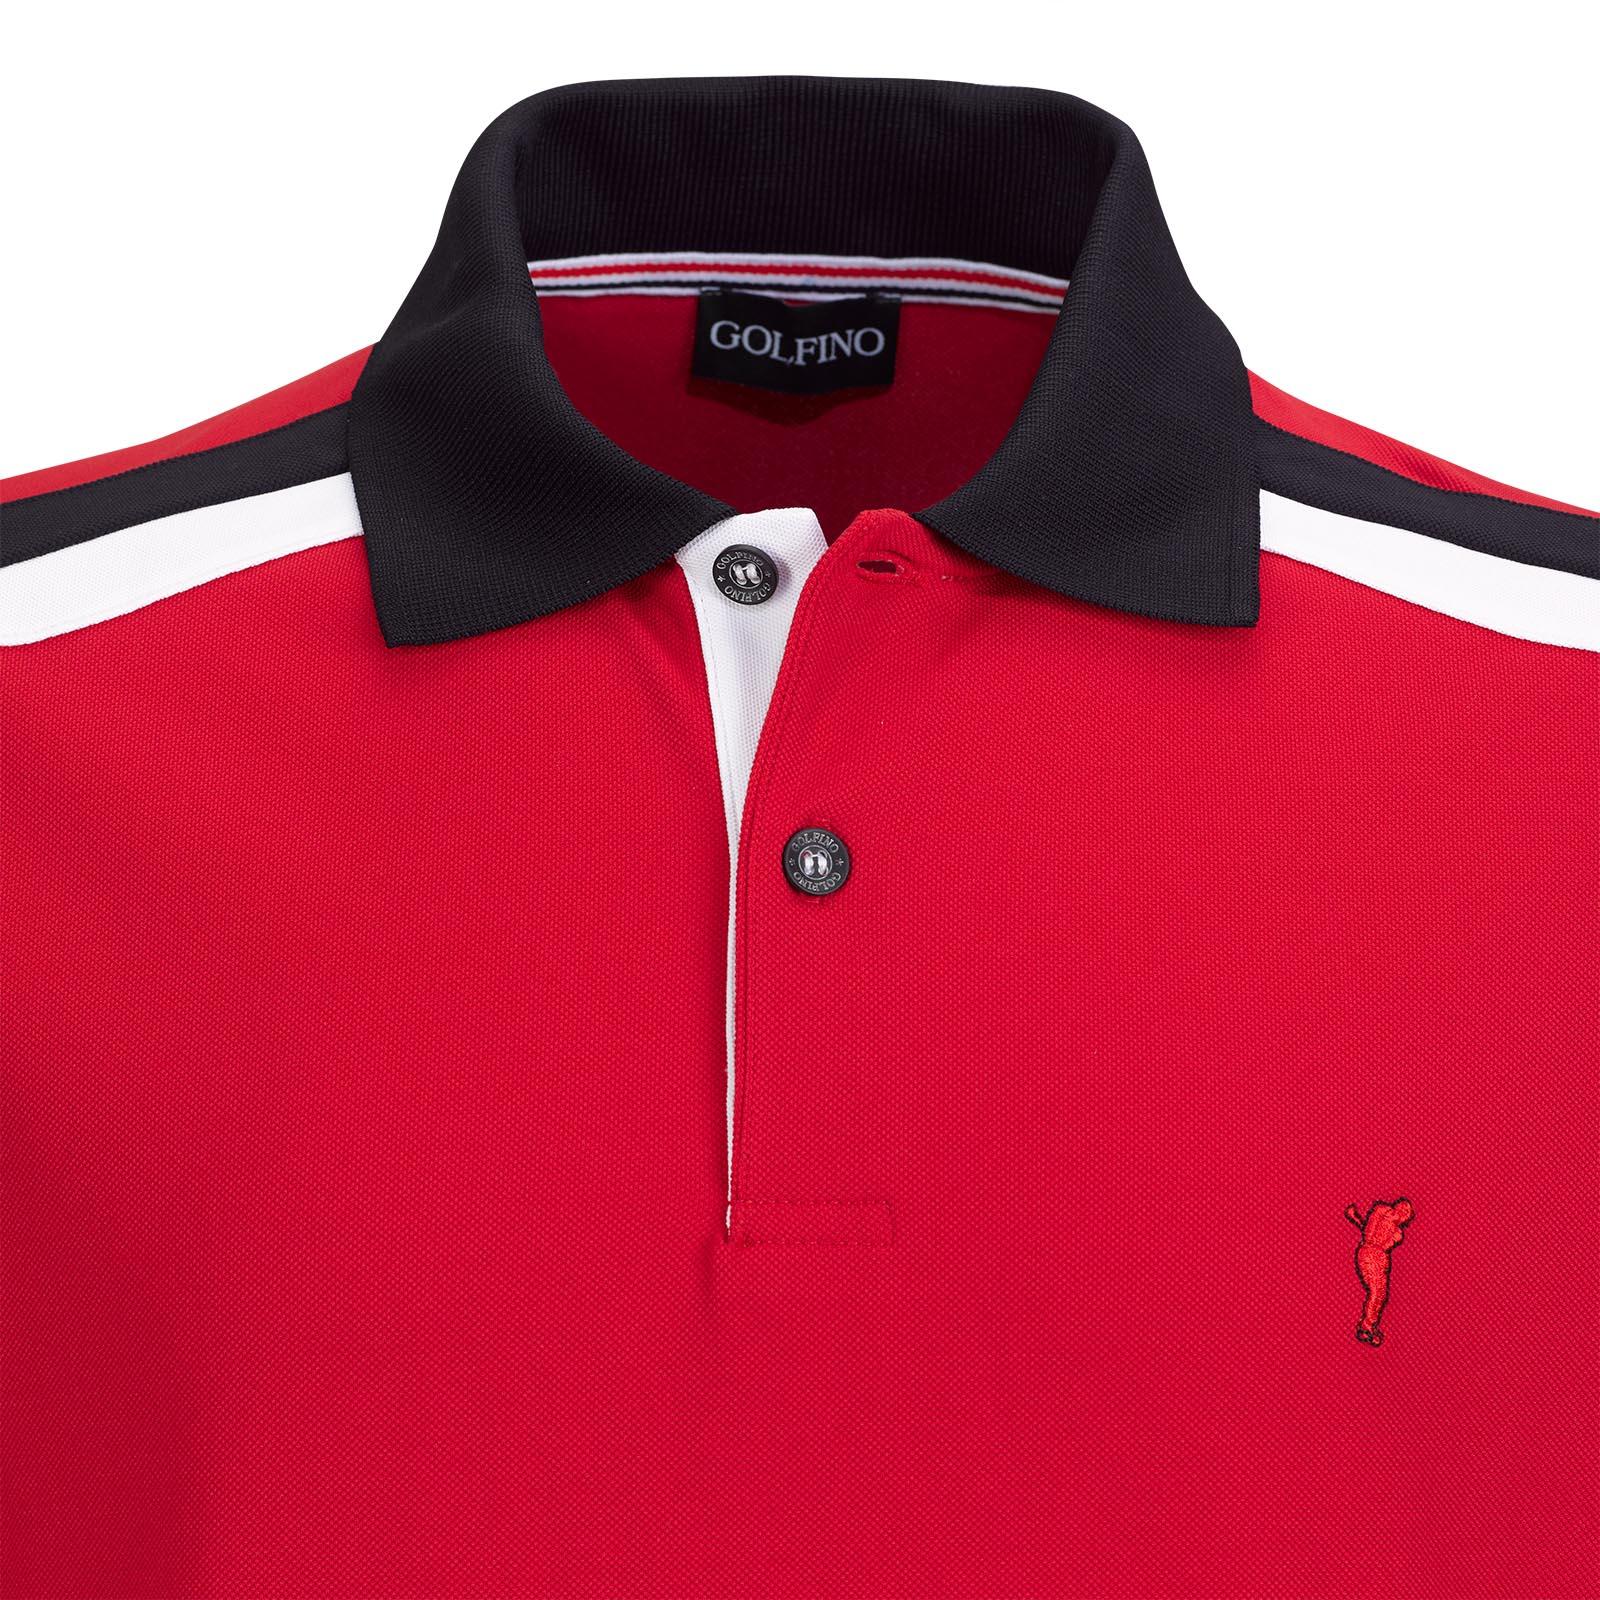 Extra Dry Herren Kurzarm Golf-Piqué im Pro Look mit Farbkontrasten